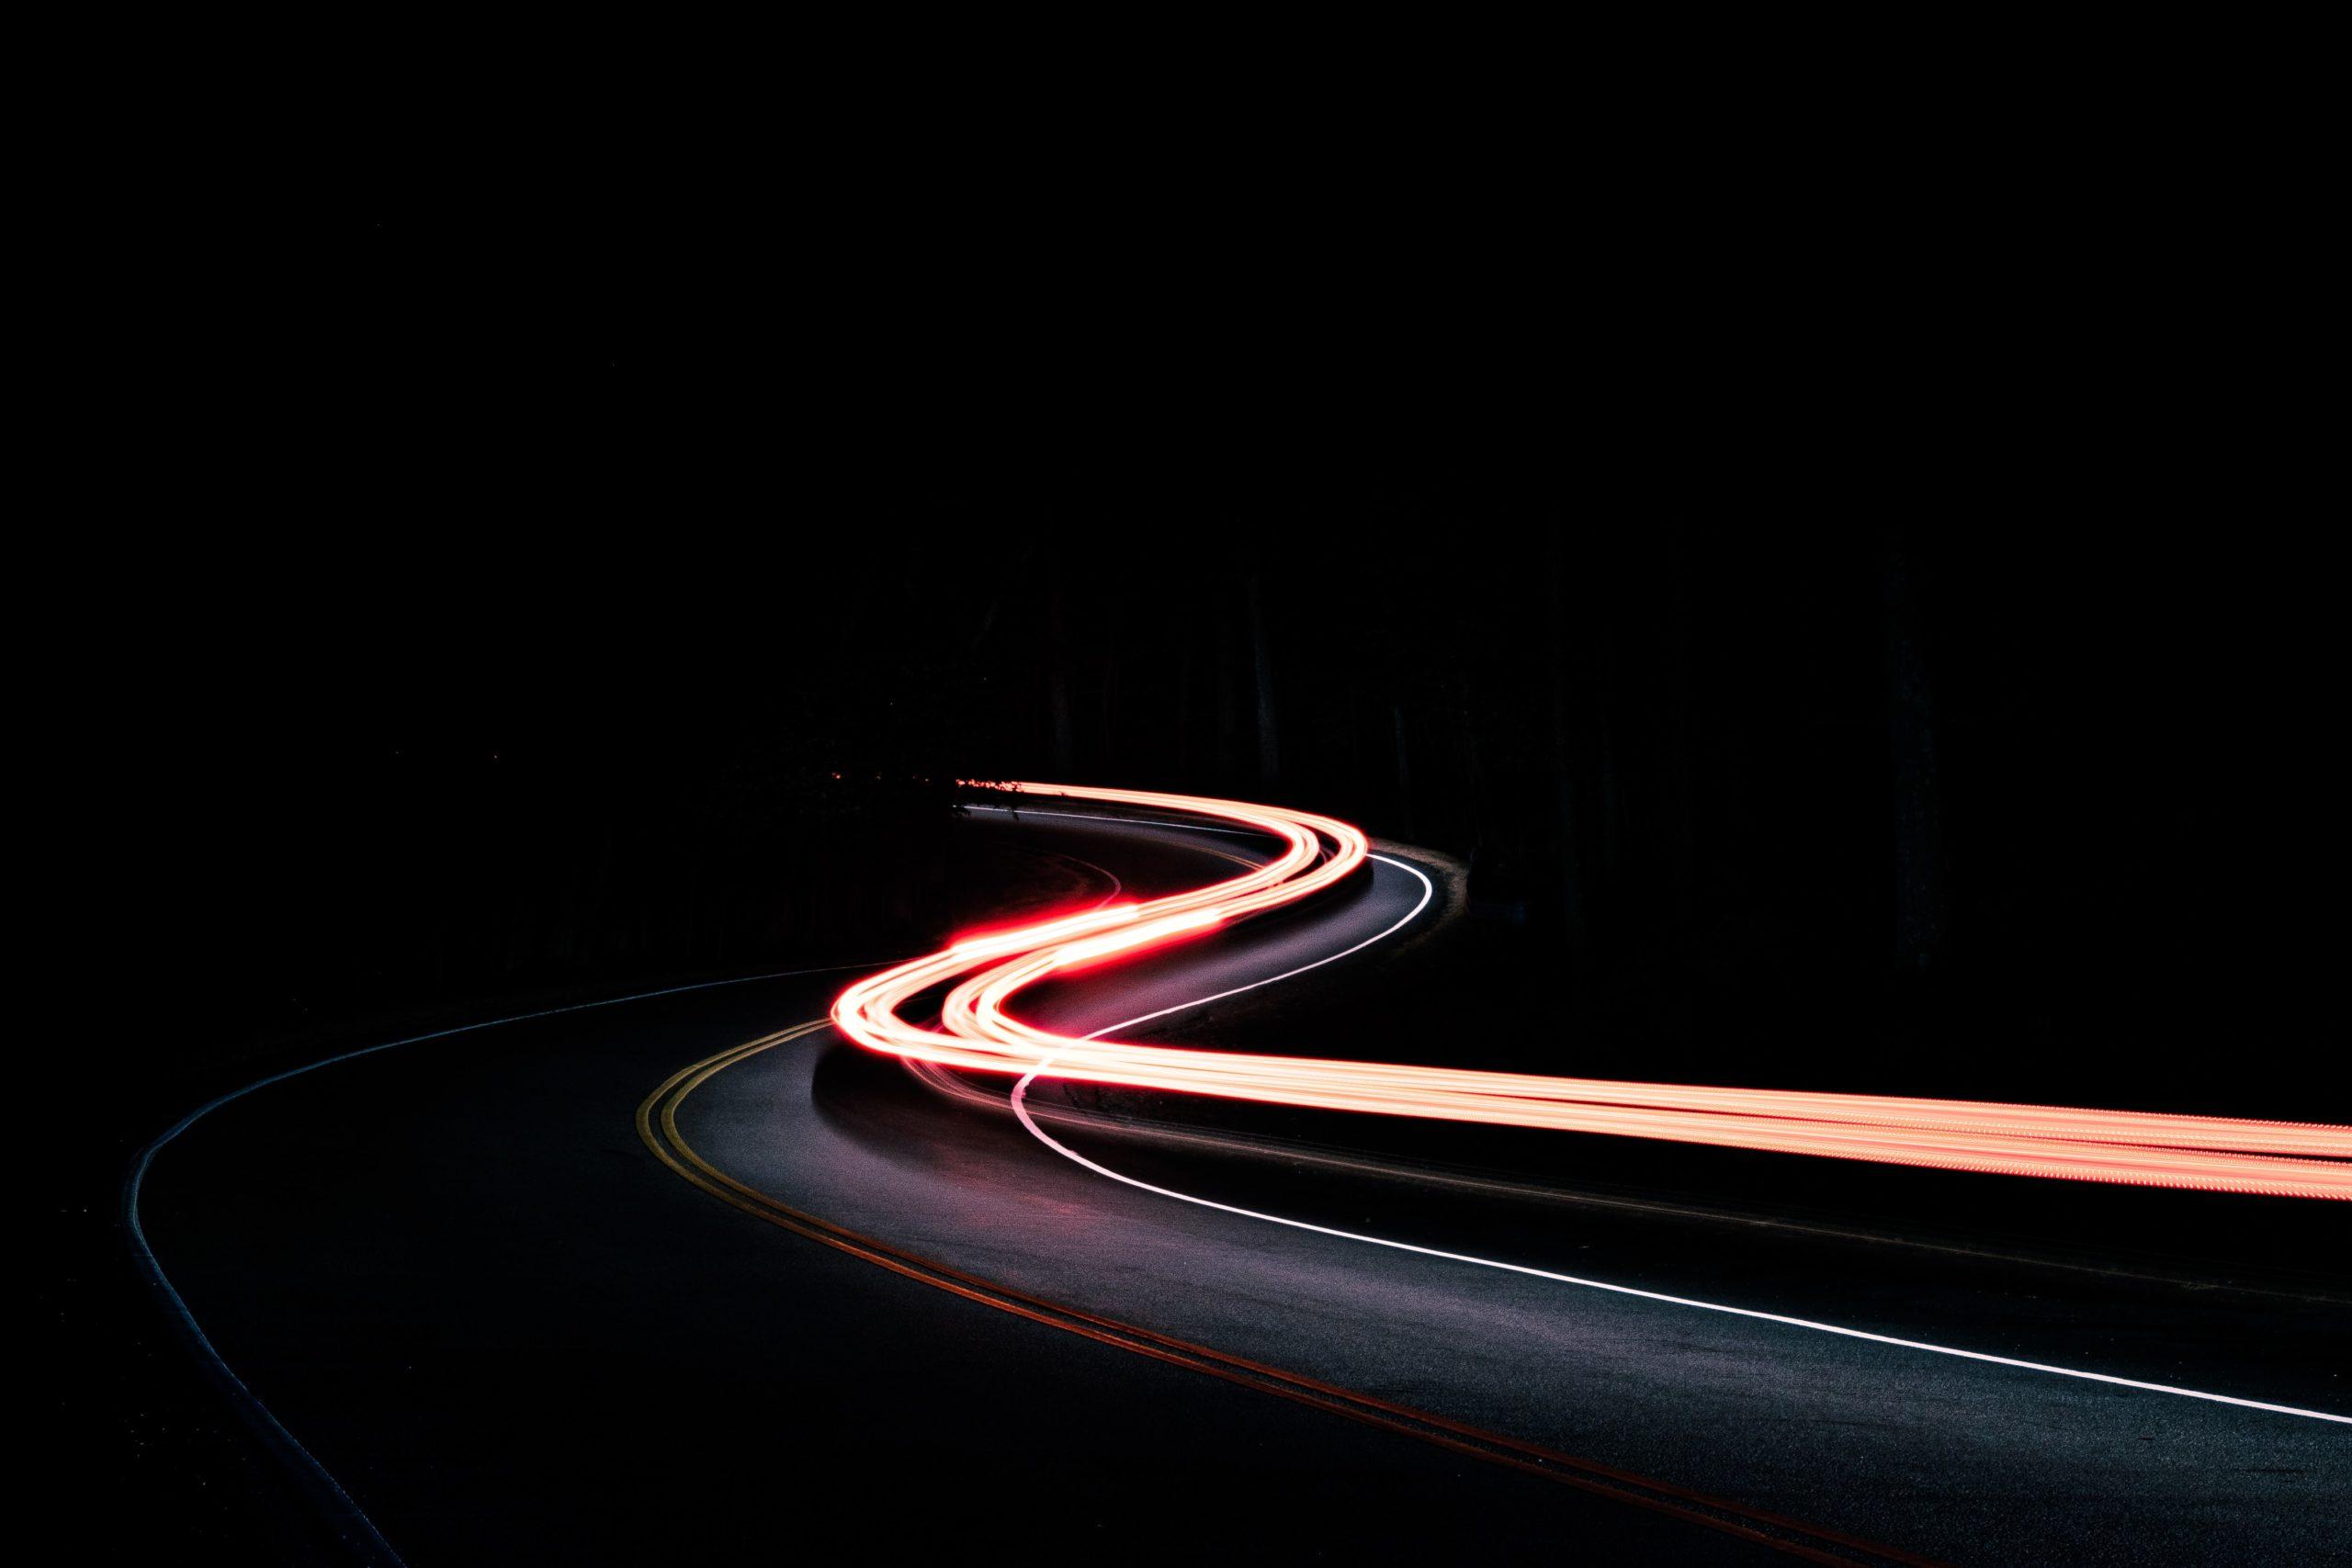 Versnelde digitale transitie in de coronacrisis